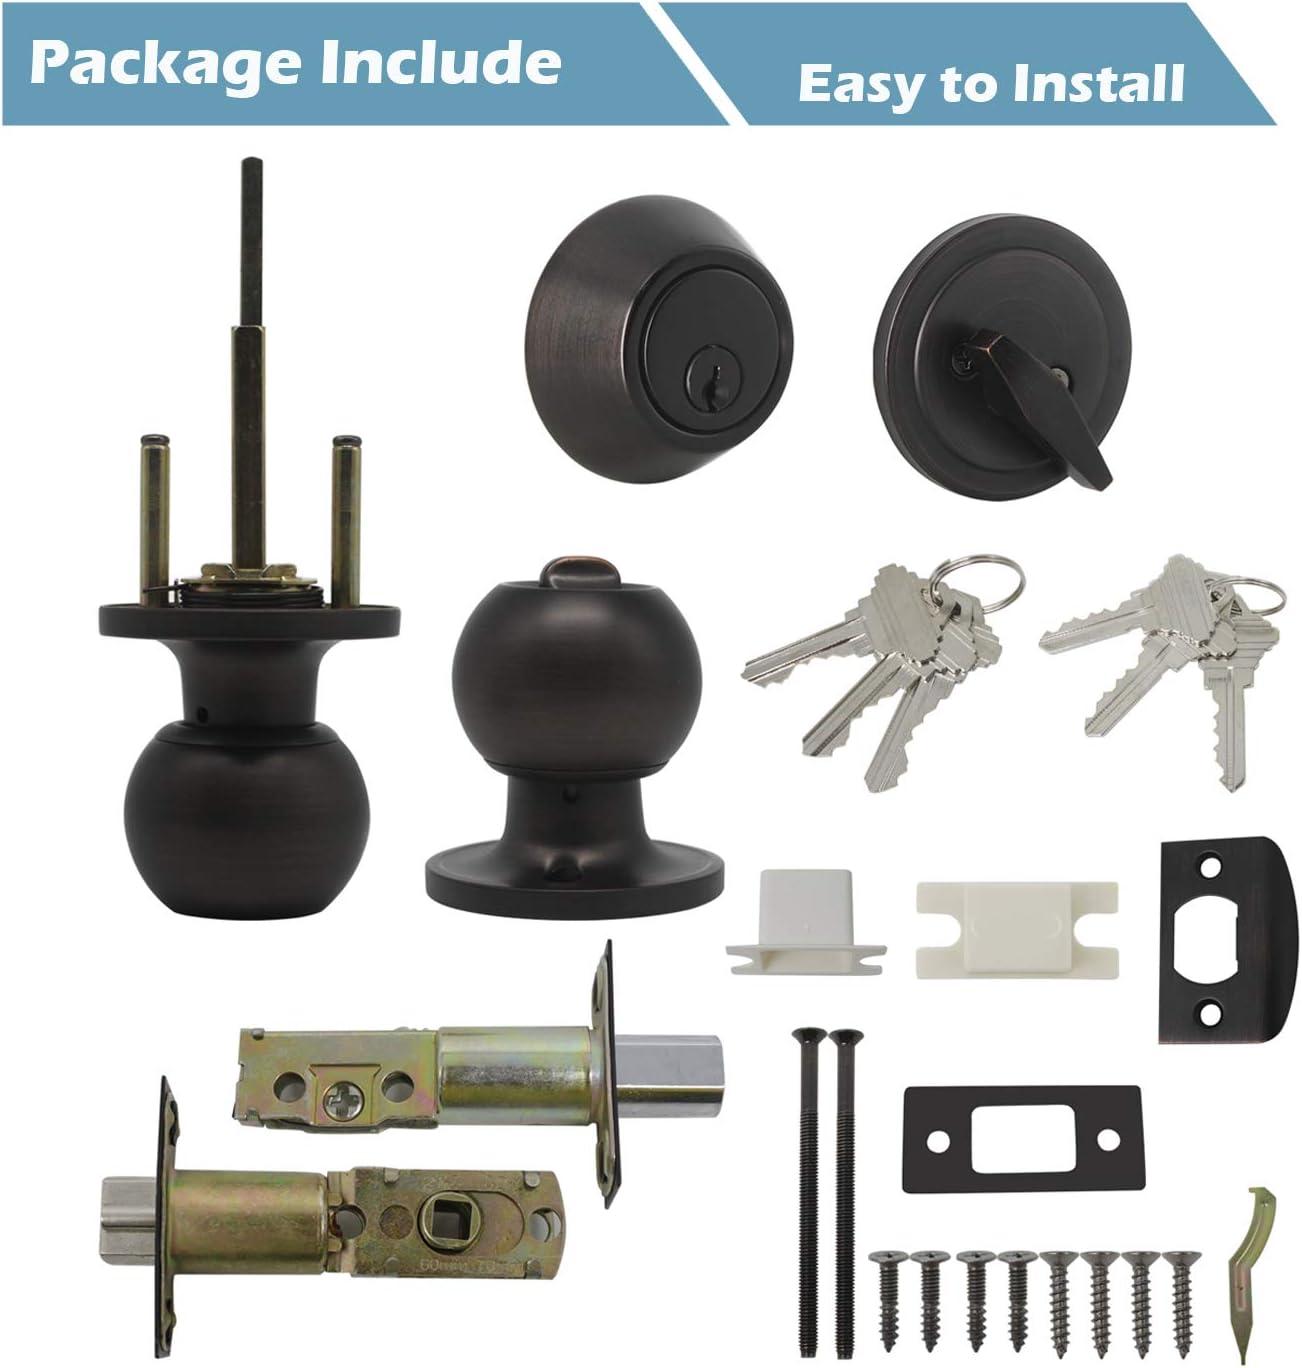 1Pack Gobrico Oil Rubbed Bronze Keyed-Alike Round Ball Entry Door Knob Lockset and Double Cylinder Deadbolt Keyed on Both Side